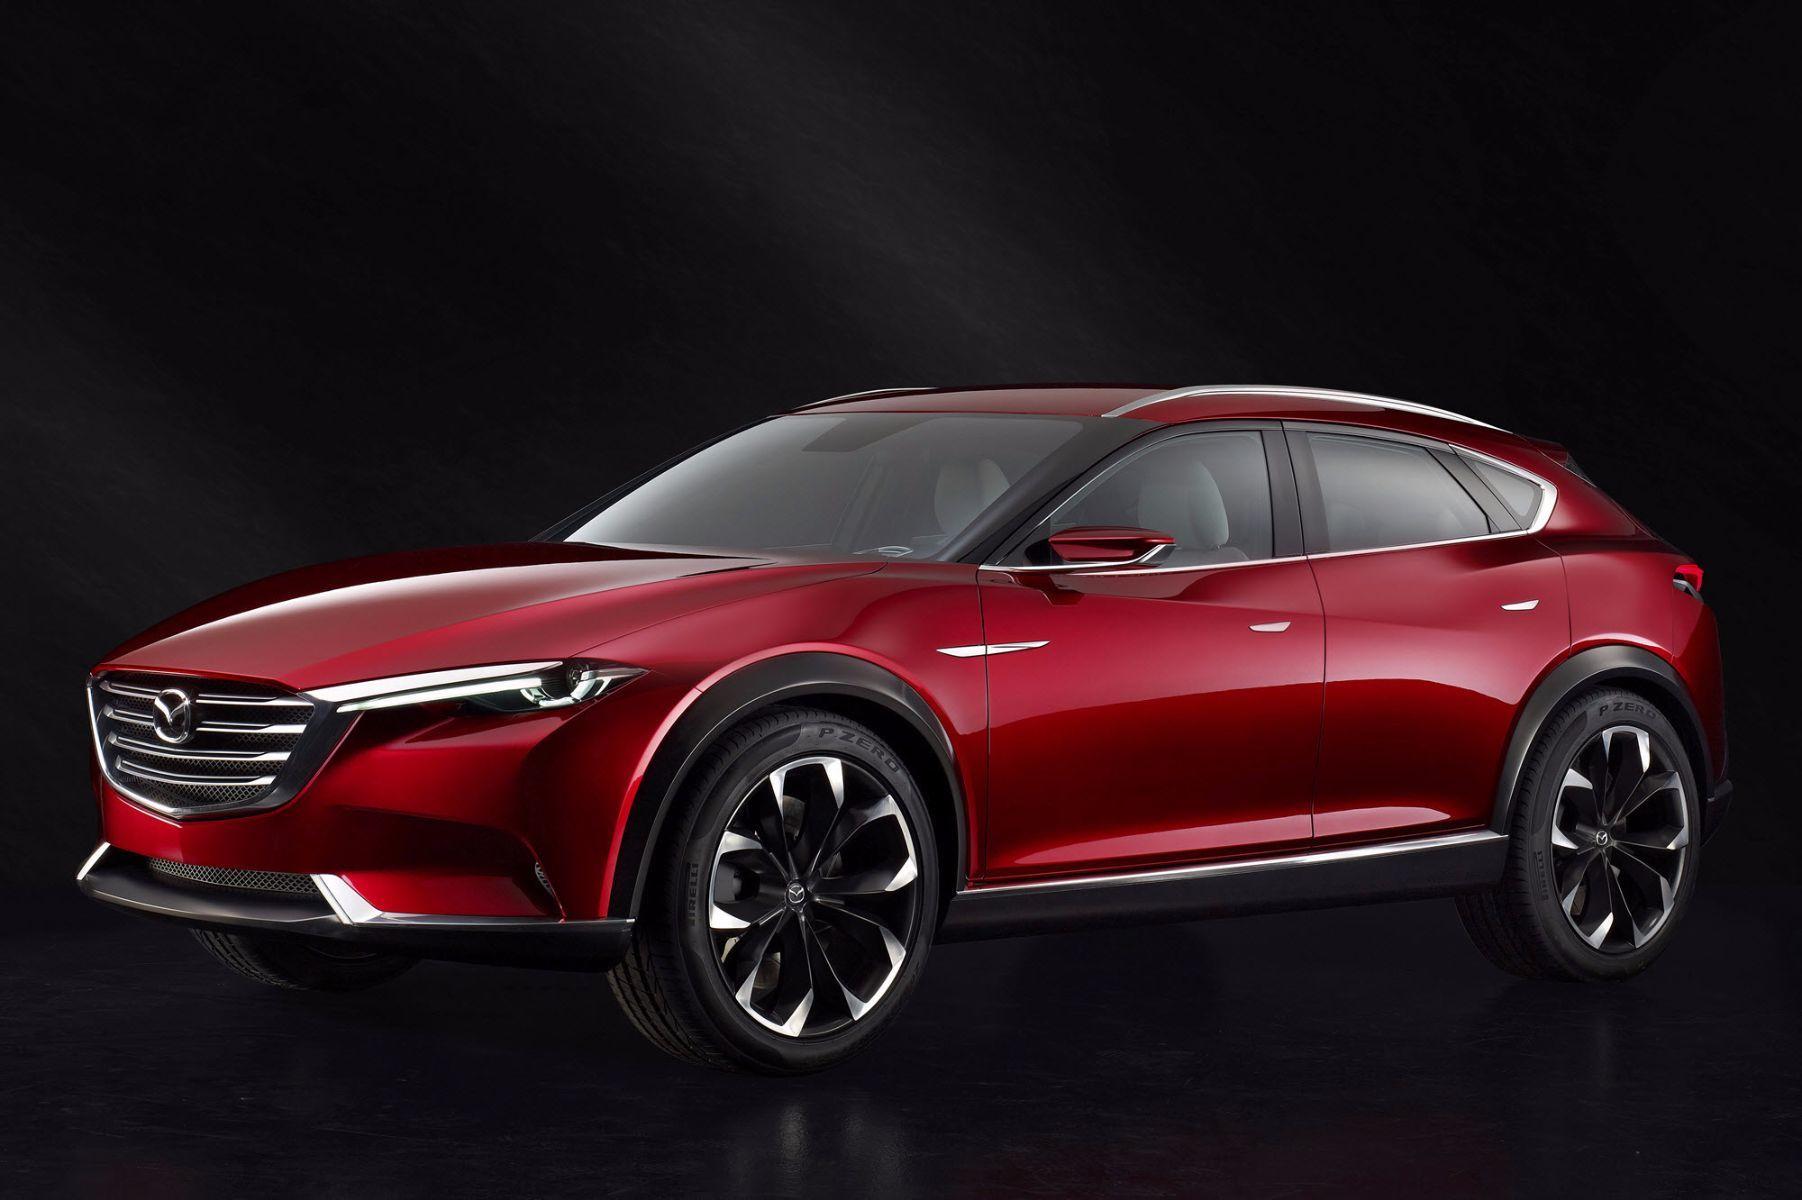 Mazda Koeru Concept at the 66th Frankfurt autoshow